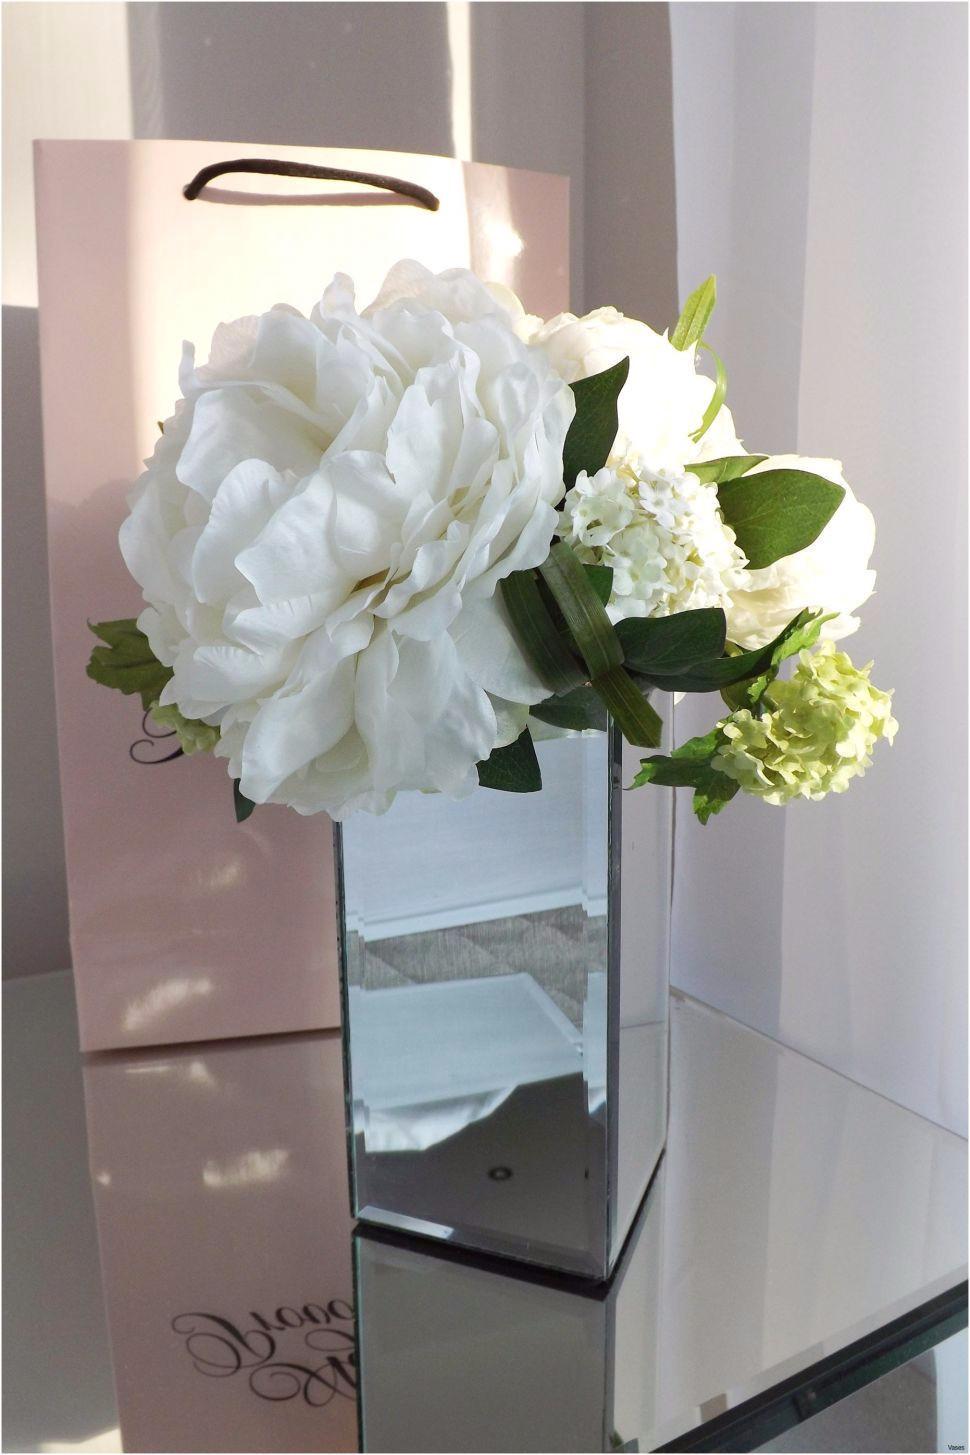 mosaic glass vases for sale of 17 inspirational metal vector geometric vase bogekompresorturkiye com with regard to flower holder for wedding best silk flowers metal vases 3h mirrored mosaic vase votivei 0d